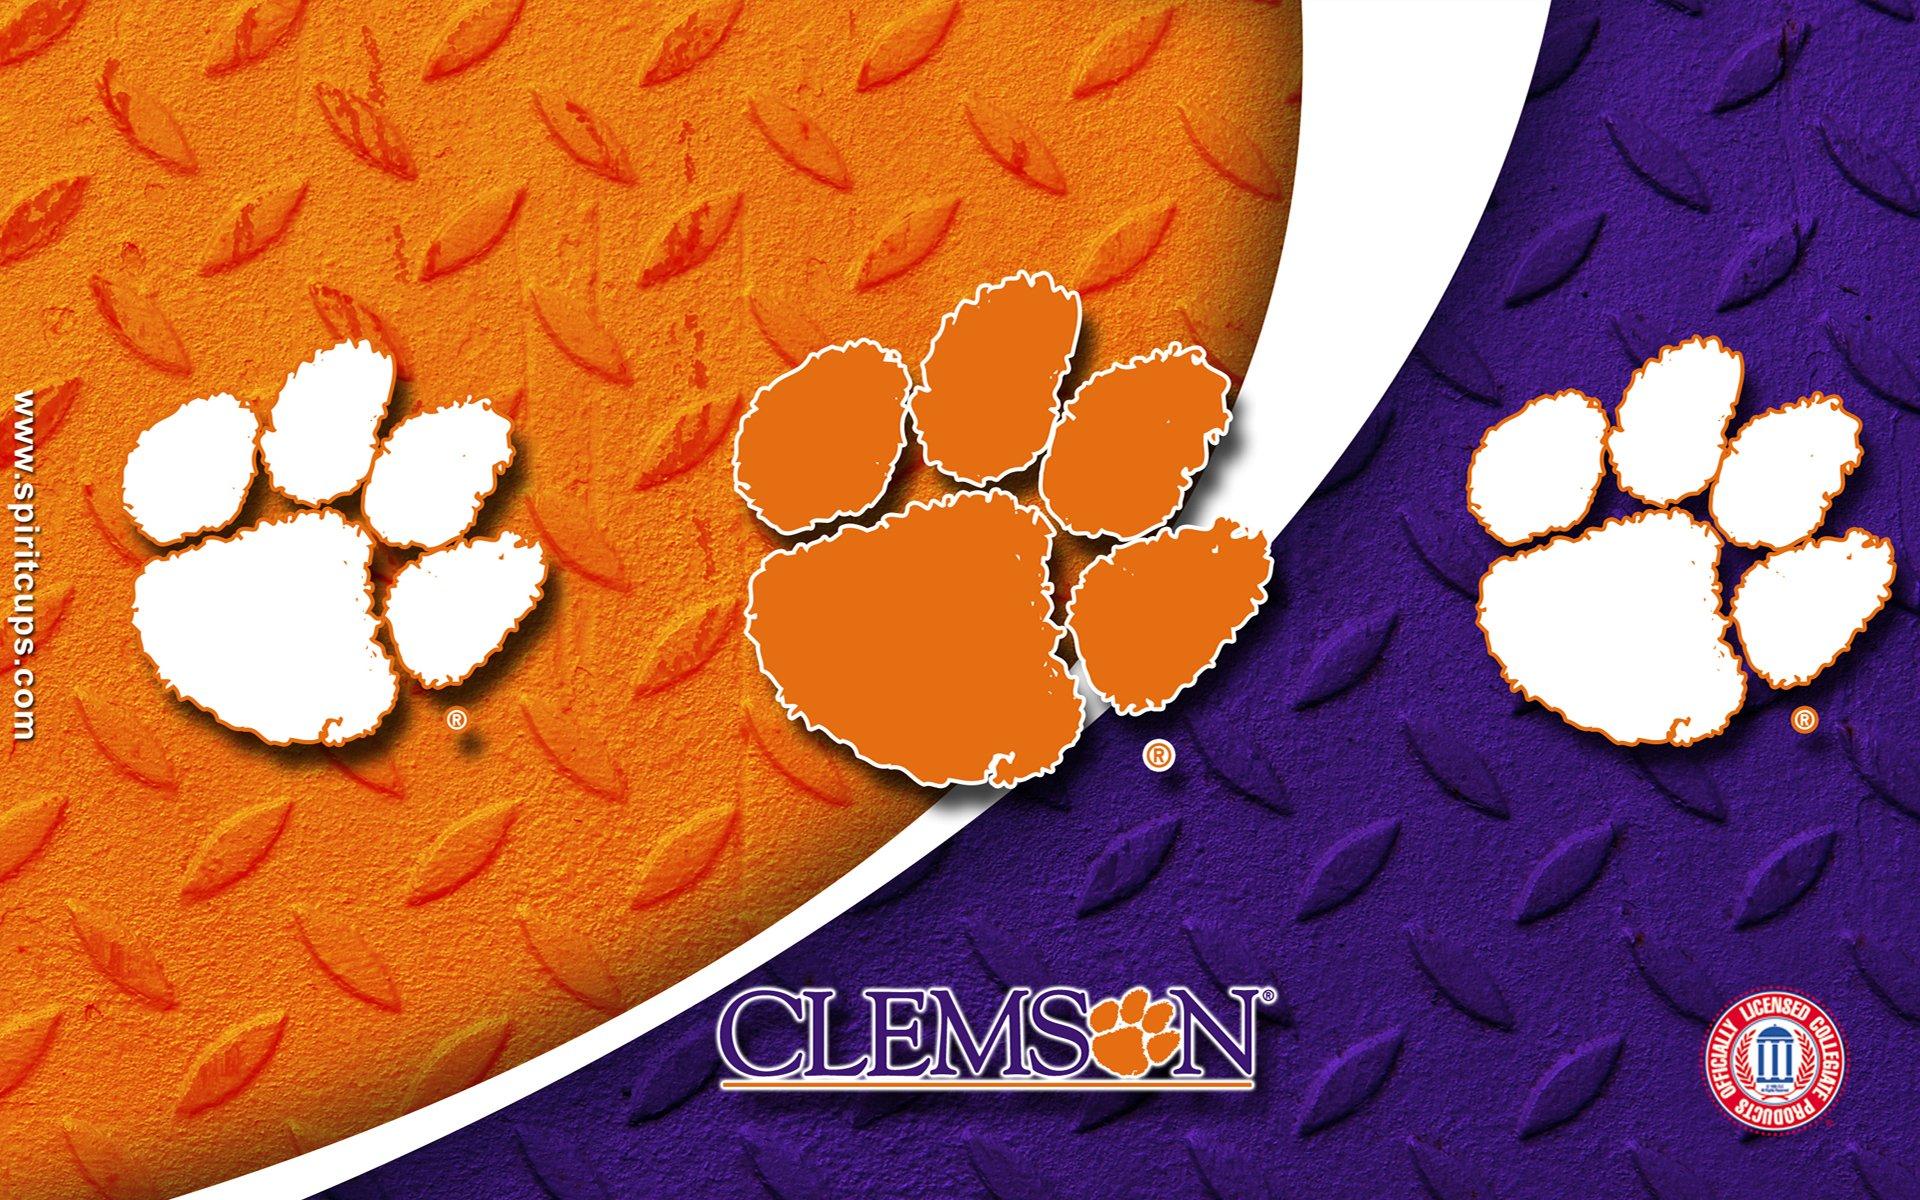 CLEMSON TIGERS college football wallpaper 1920x1200 593971 1920x1200